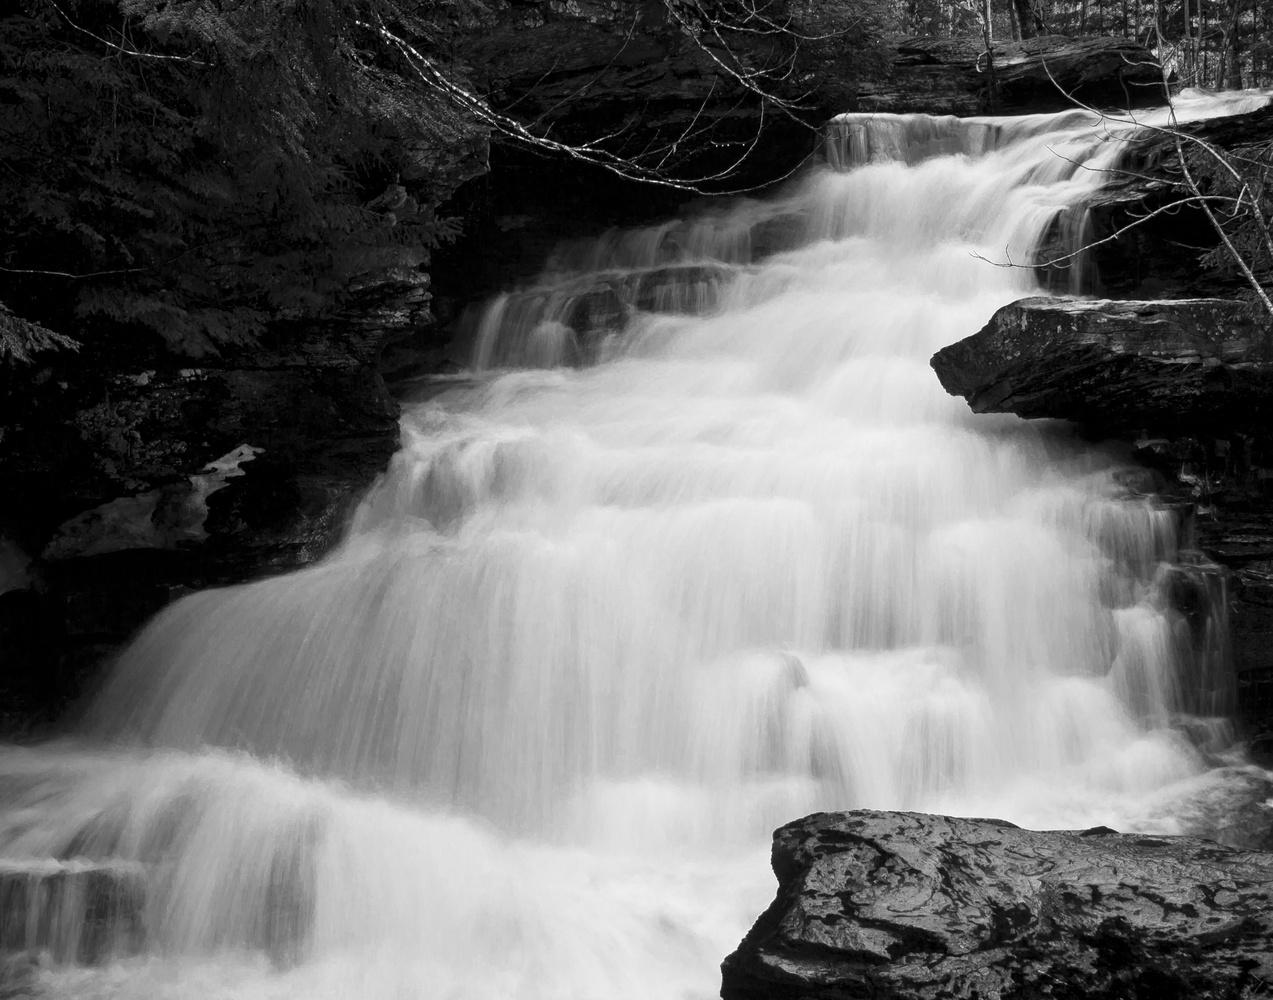 Garden Creek Falls by James Jewers